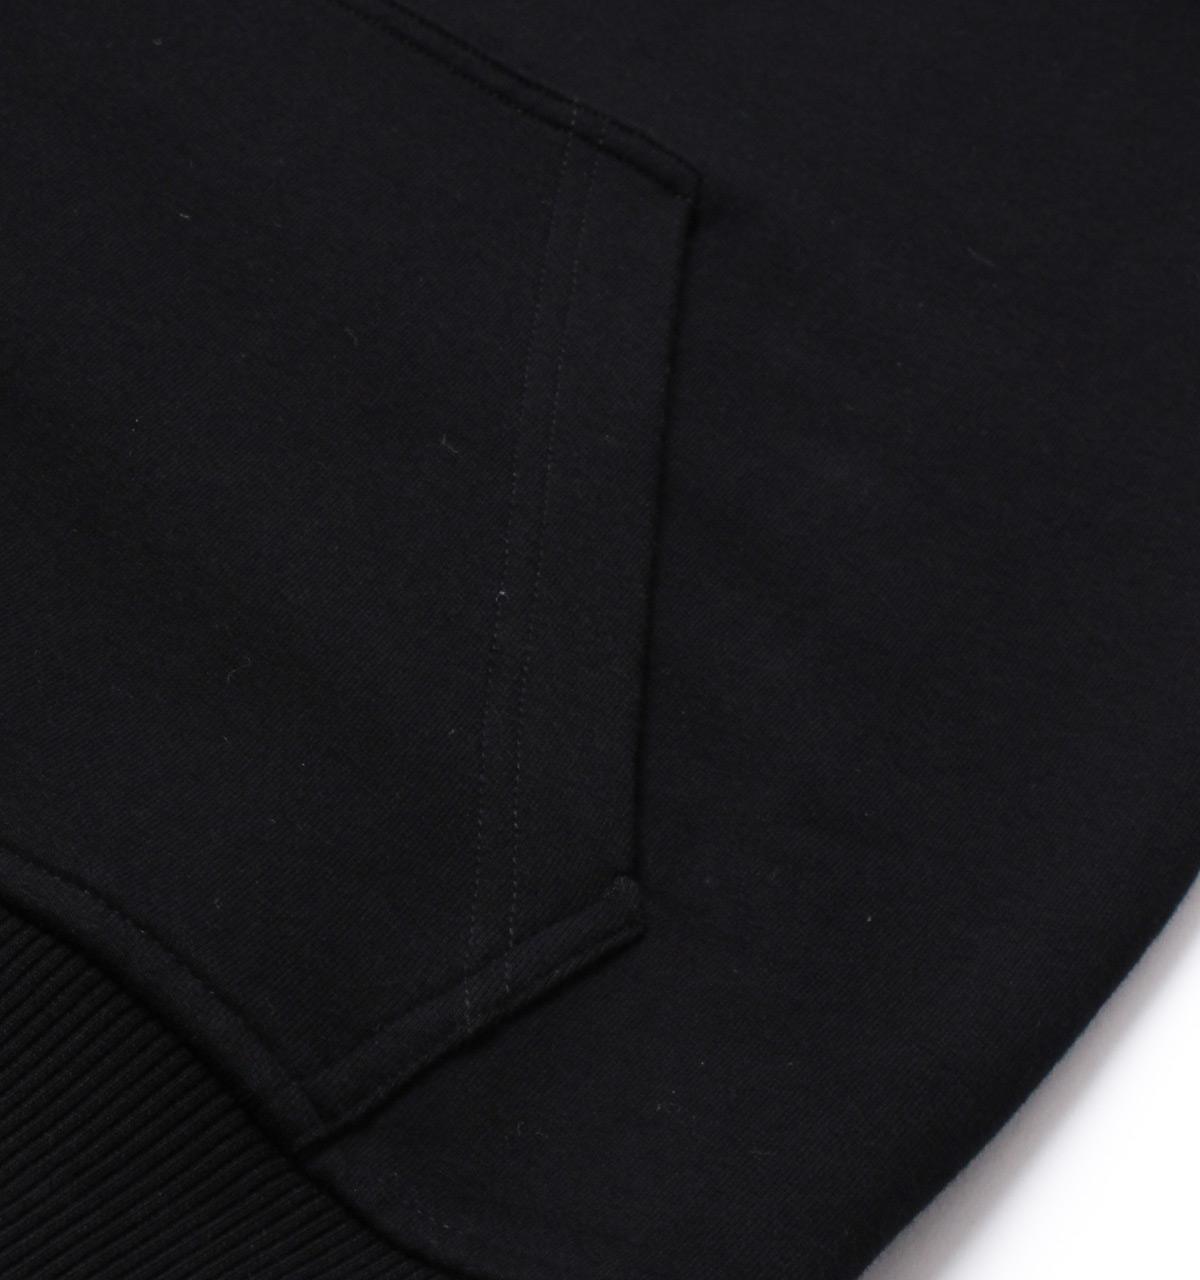 Michael Kors Cotton Stretch Black Funnel Neck Sweatshirt for Men